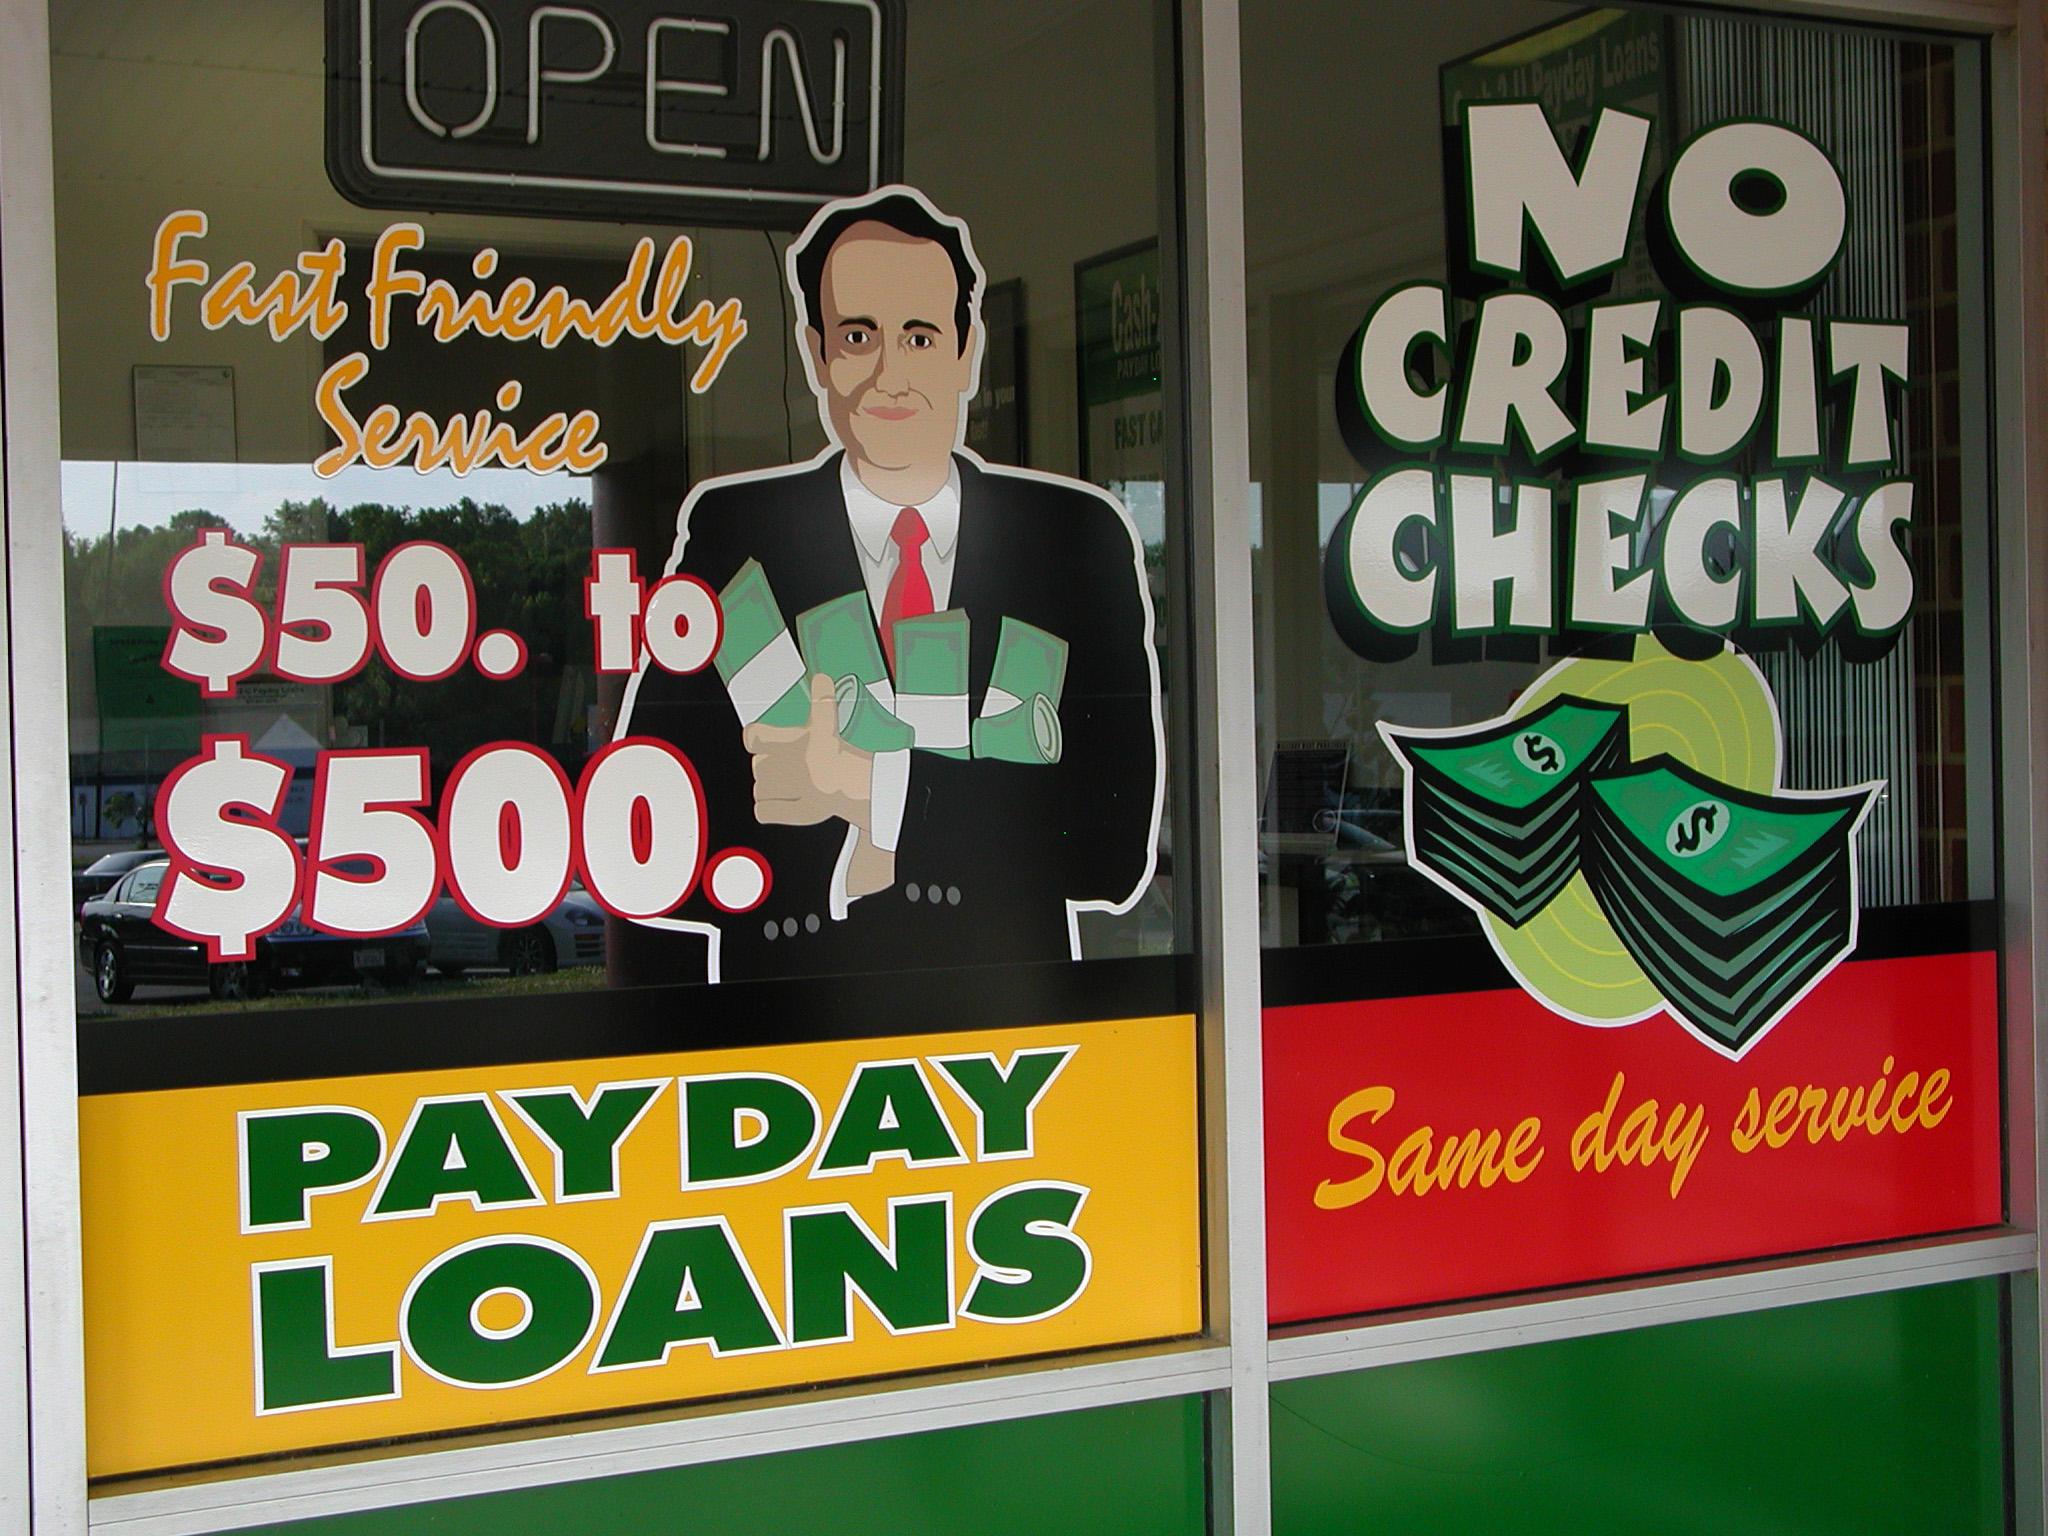 payday_loans-1.jpg